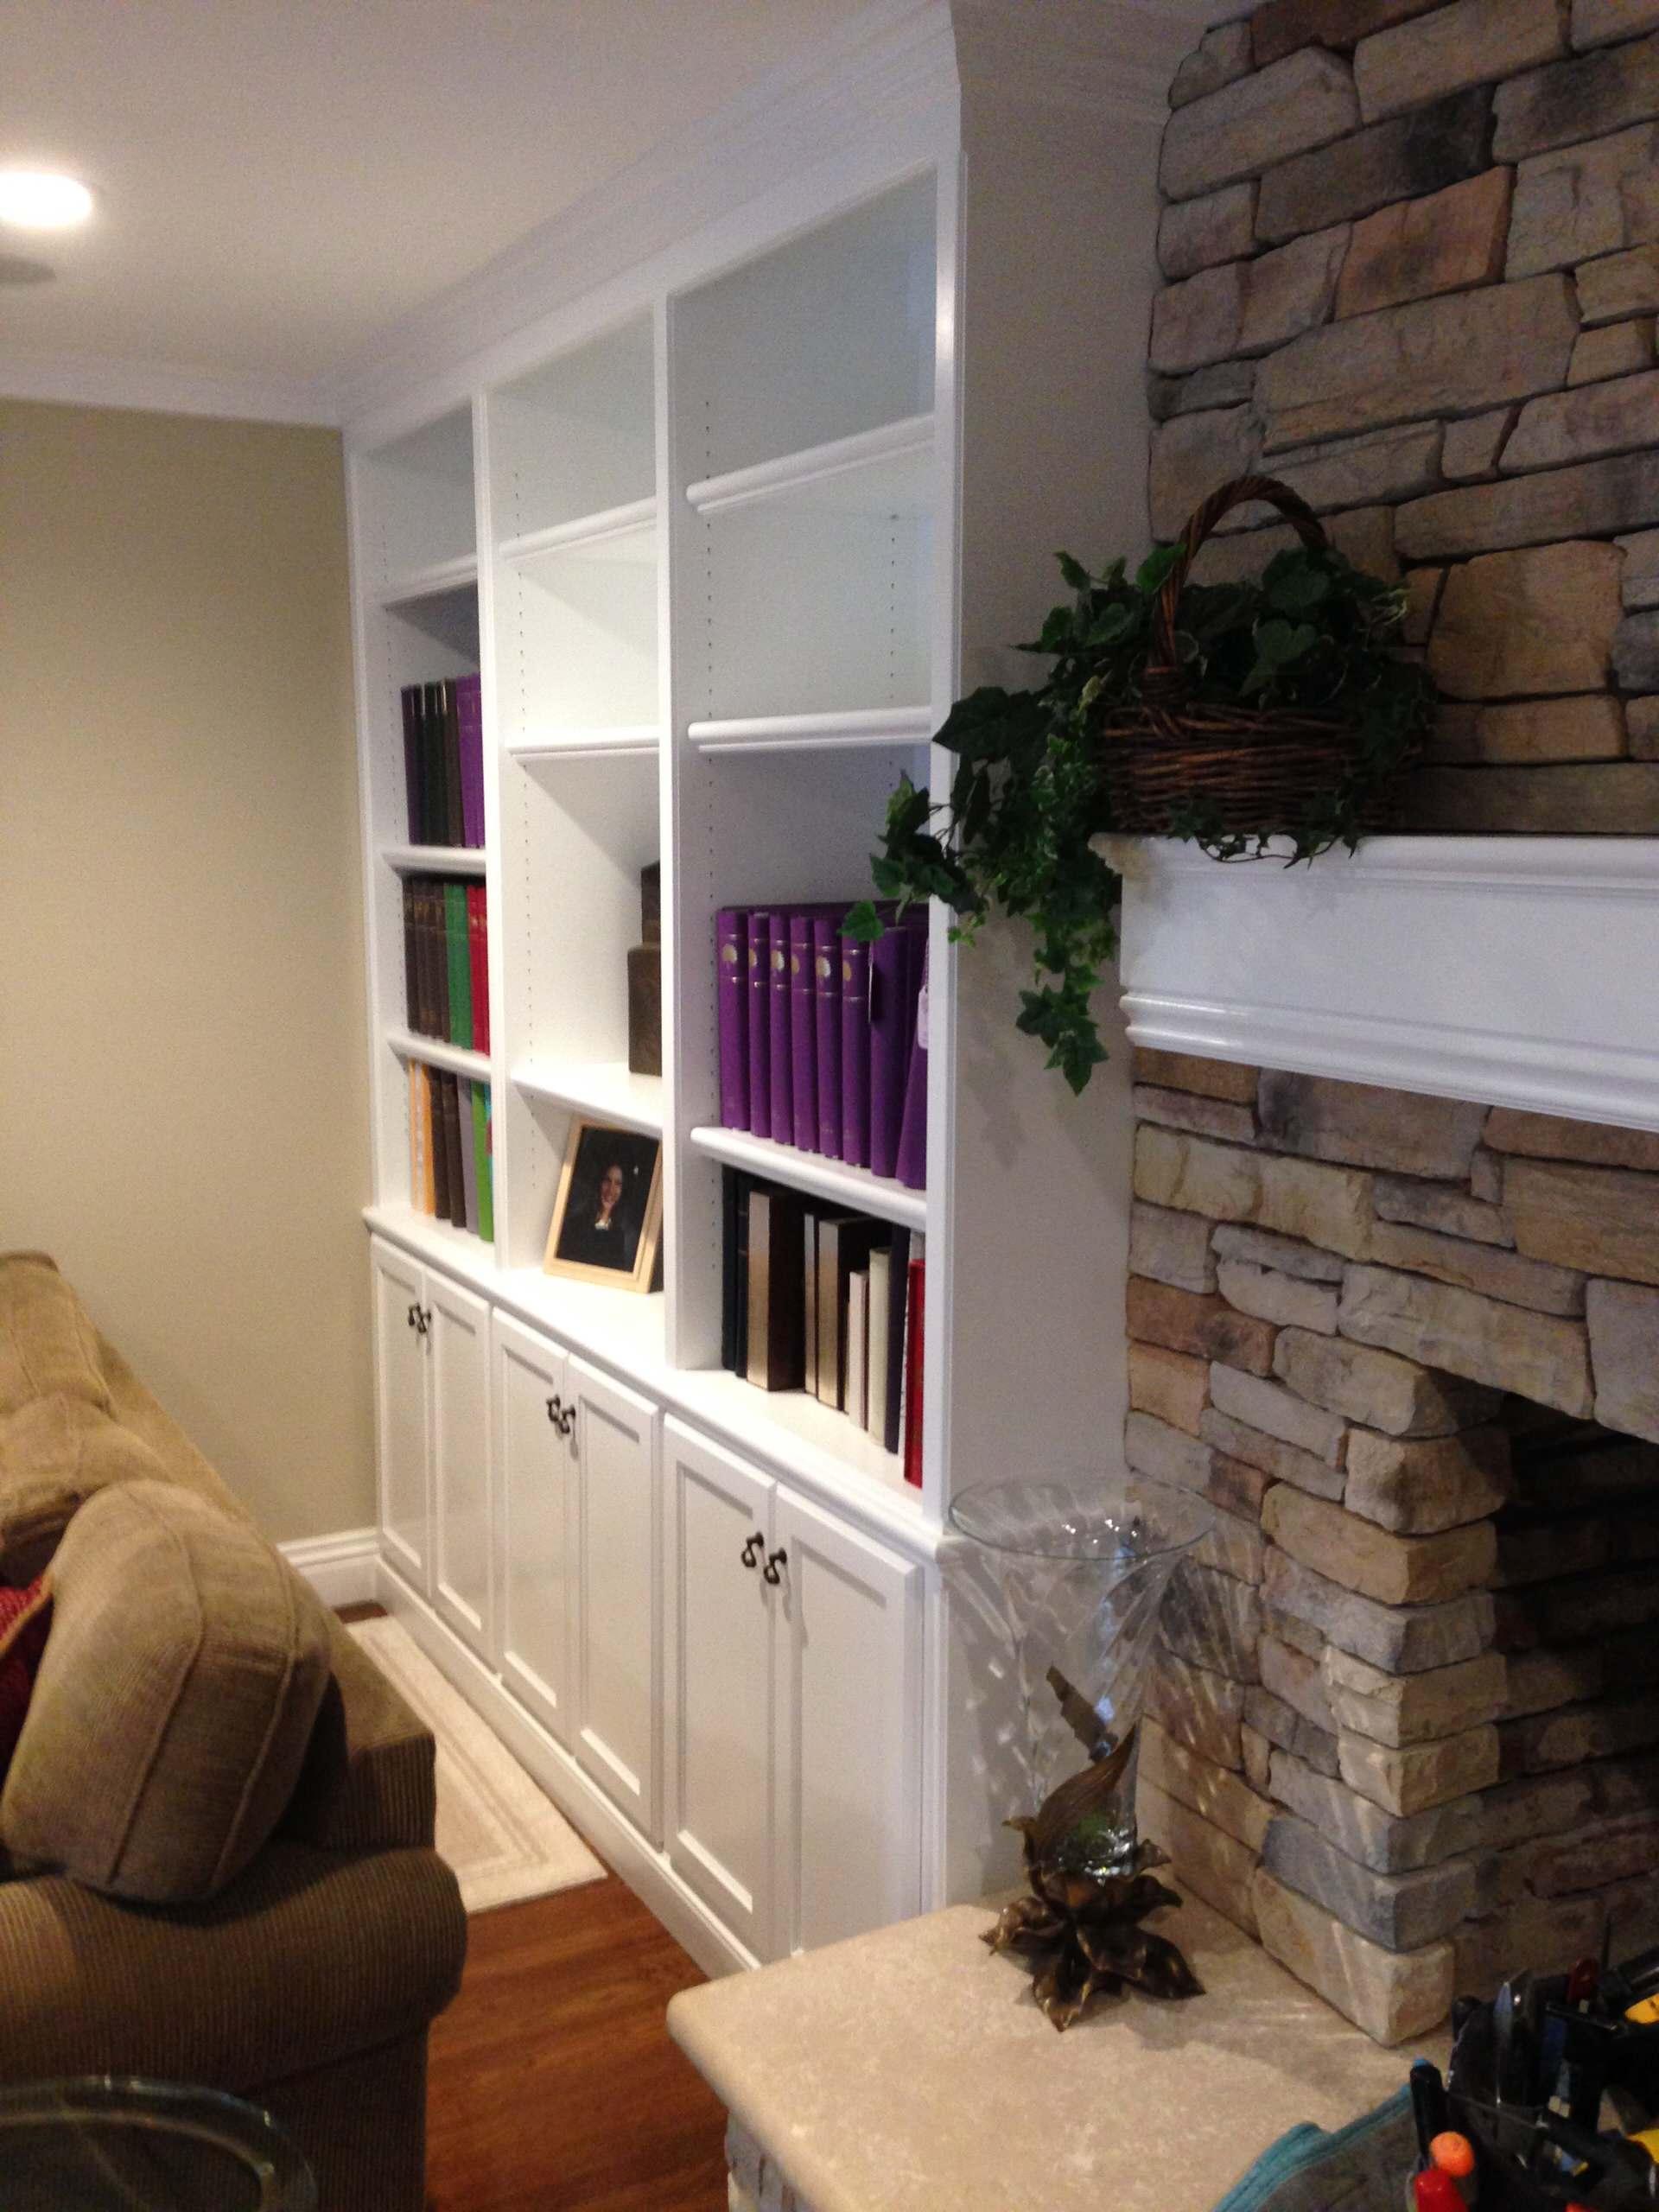 Encino Wall Unit, Bookcase & Mantle